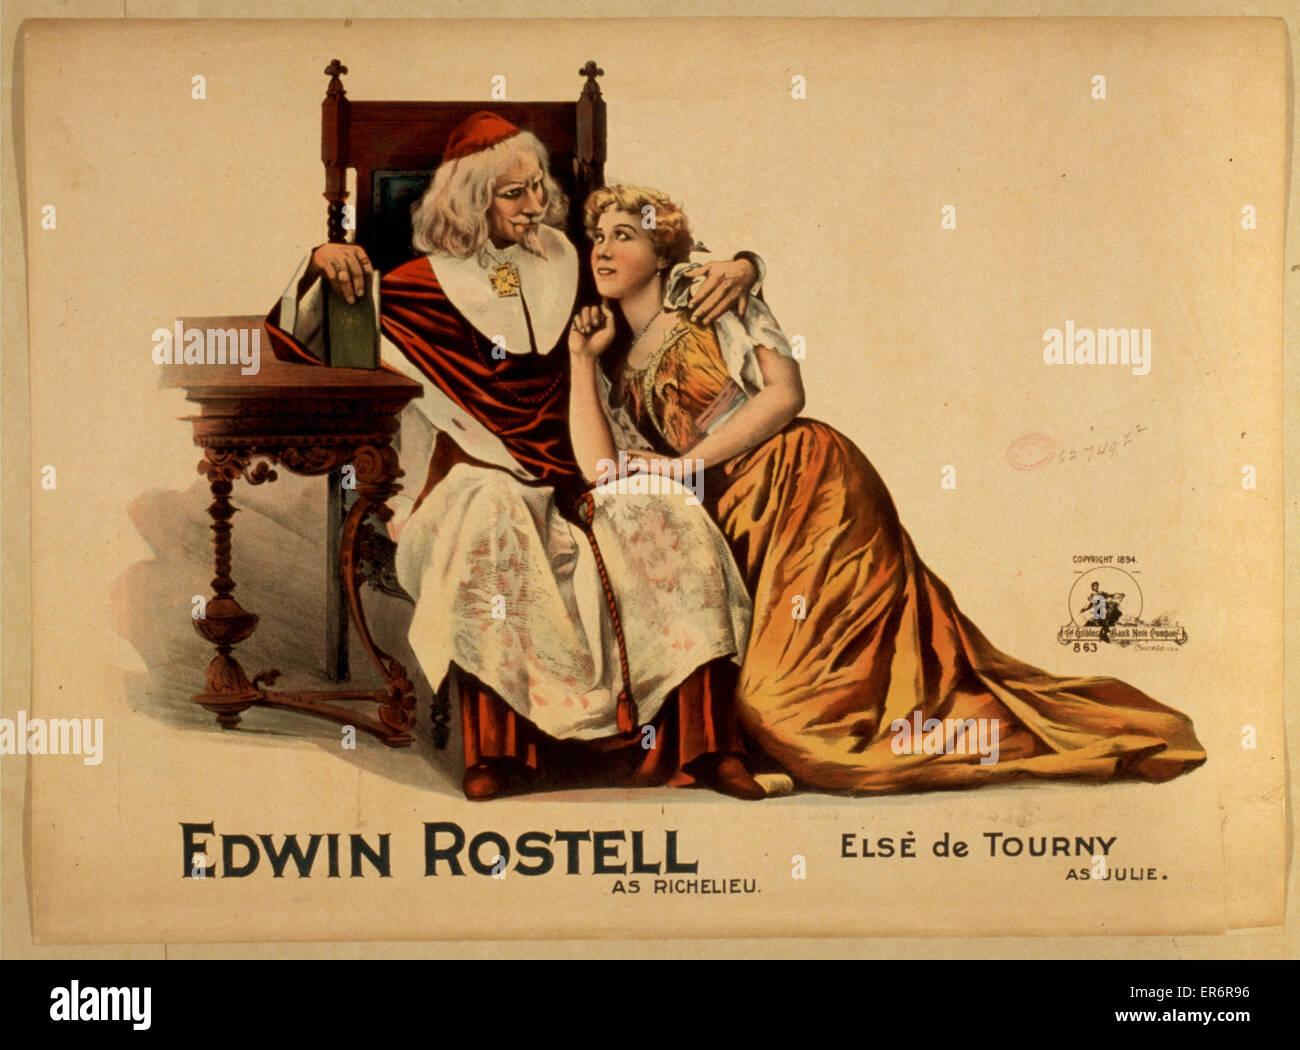 Edwin Rostell as Richelieu, Els de Tourny as Julie. Date c1894. - Stock Image